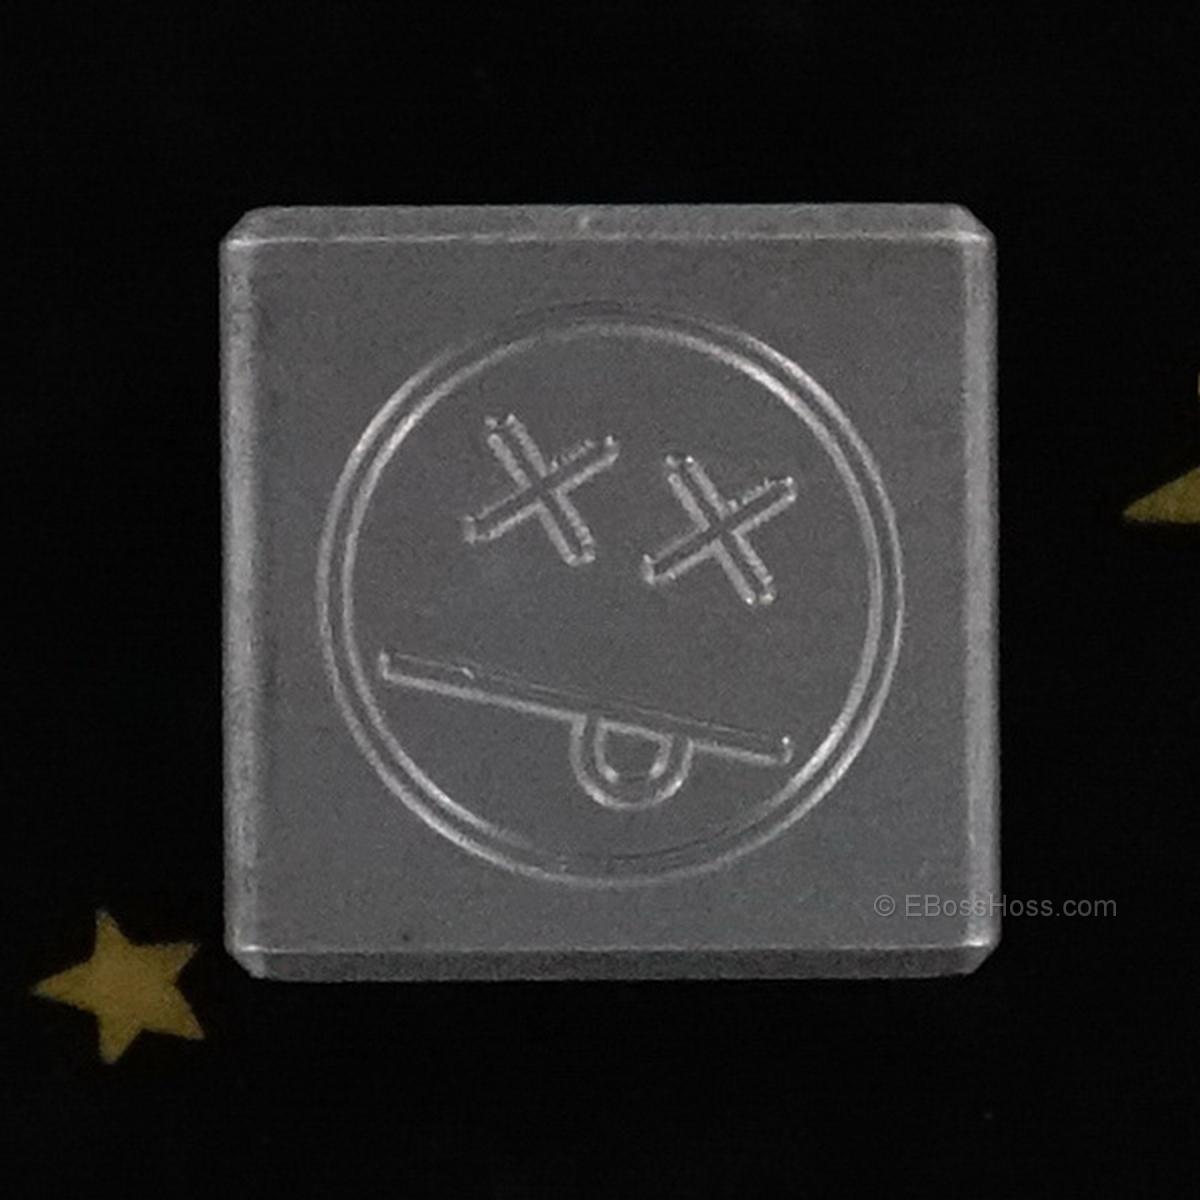 Frankart 4 Faces Iron Cube - Blade 2017